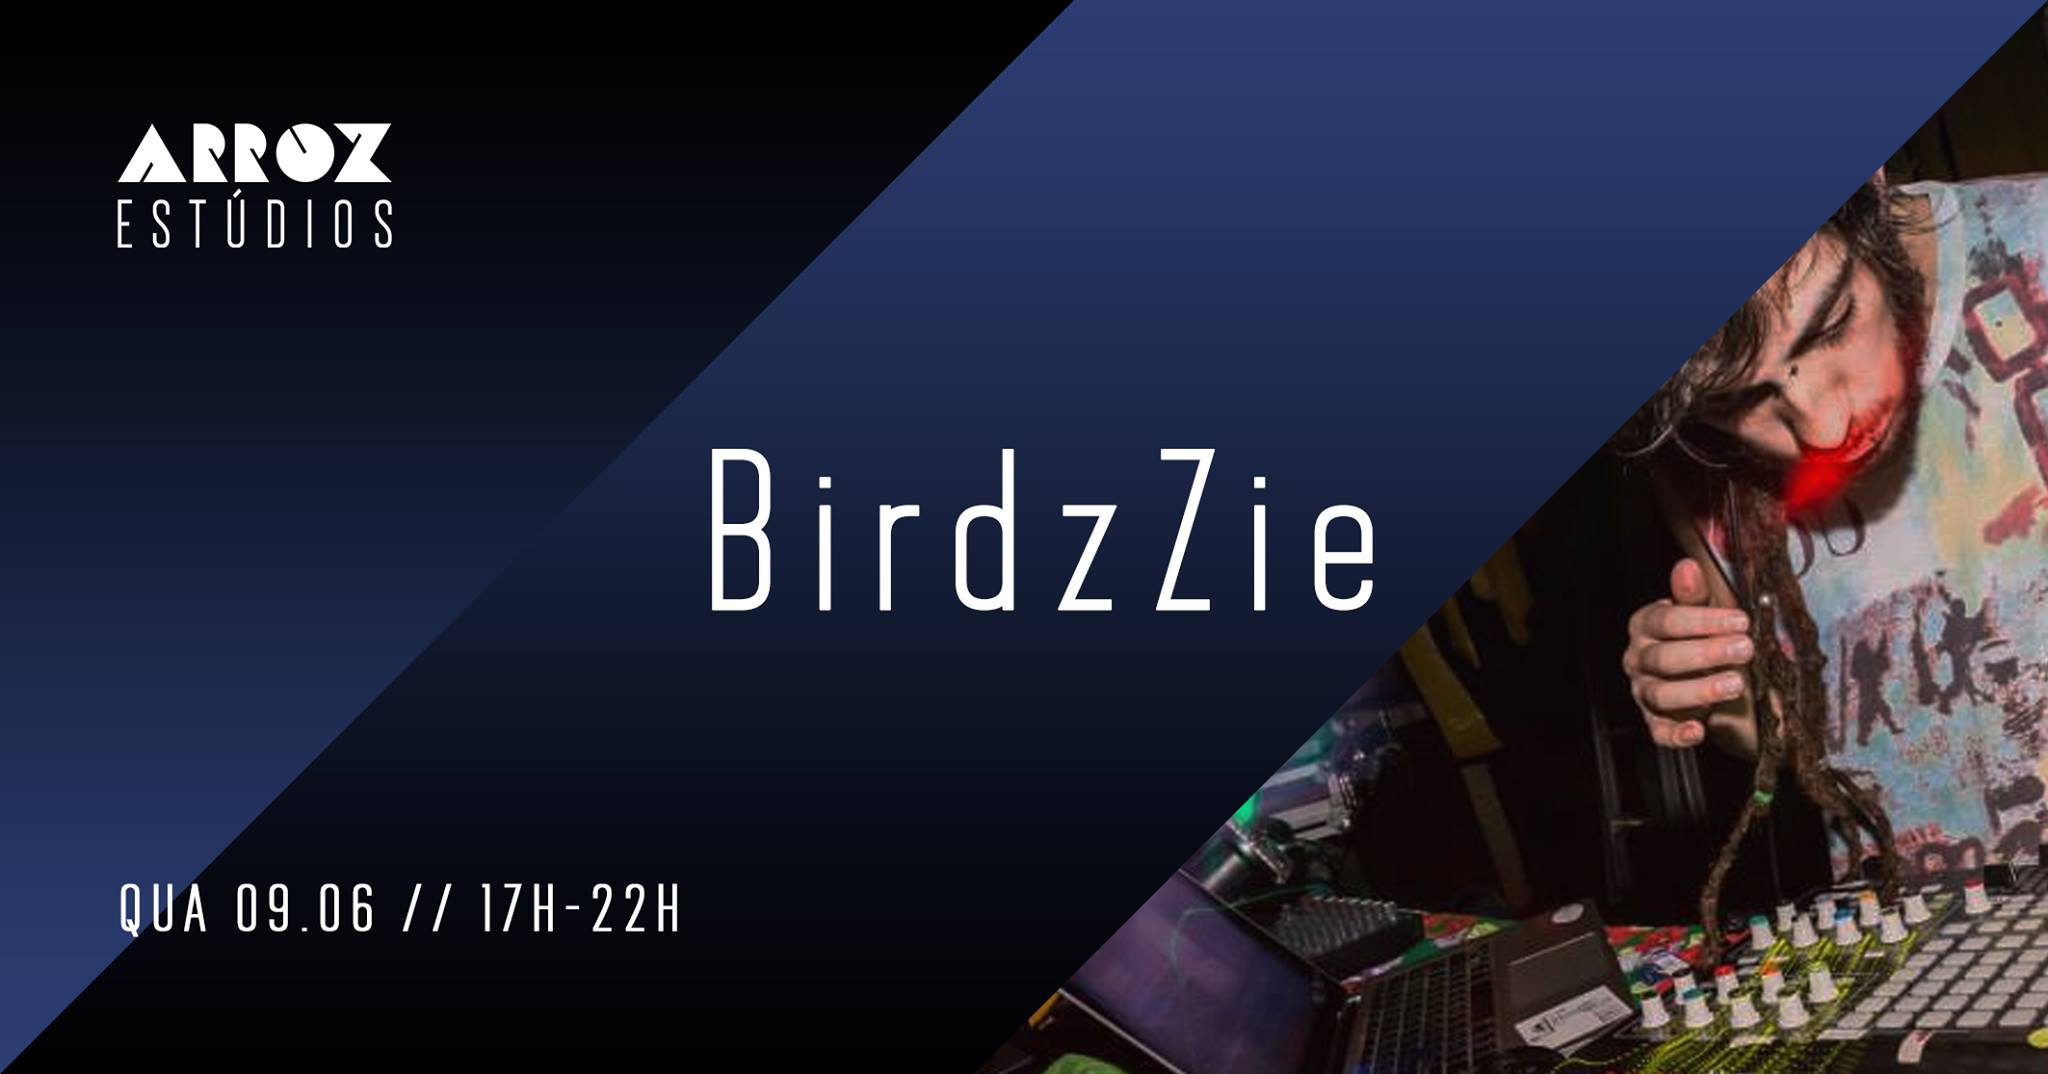 BirdzZie - Arroz Esplanadas